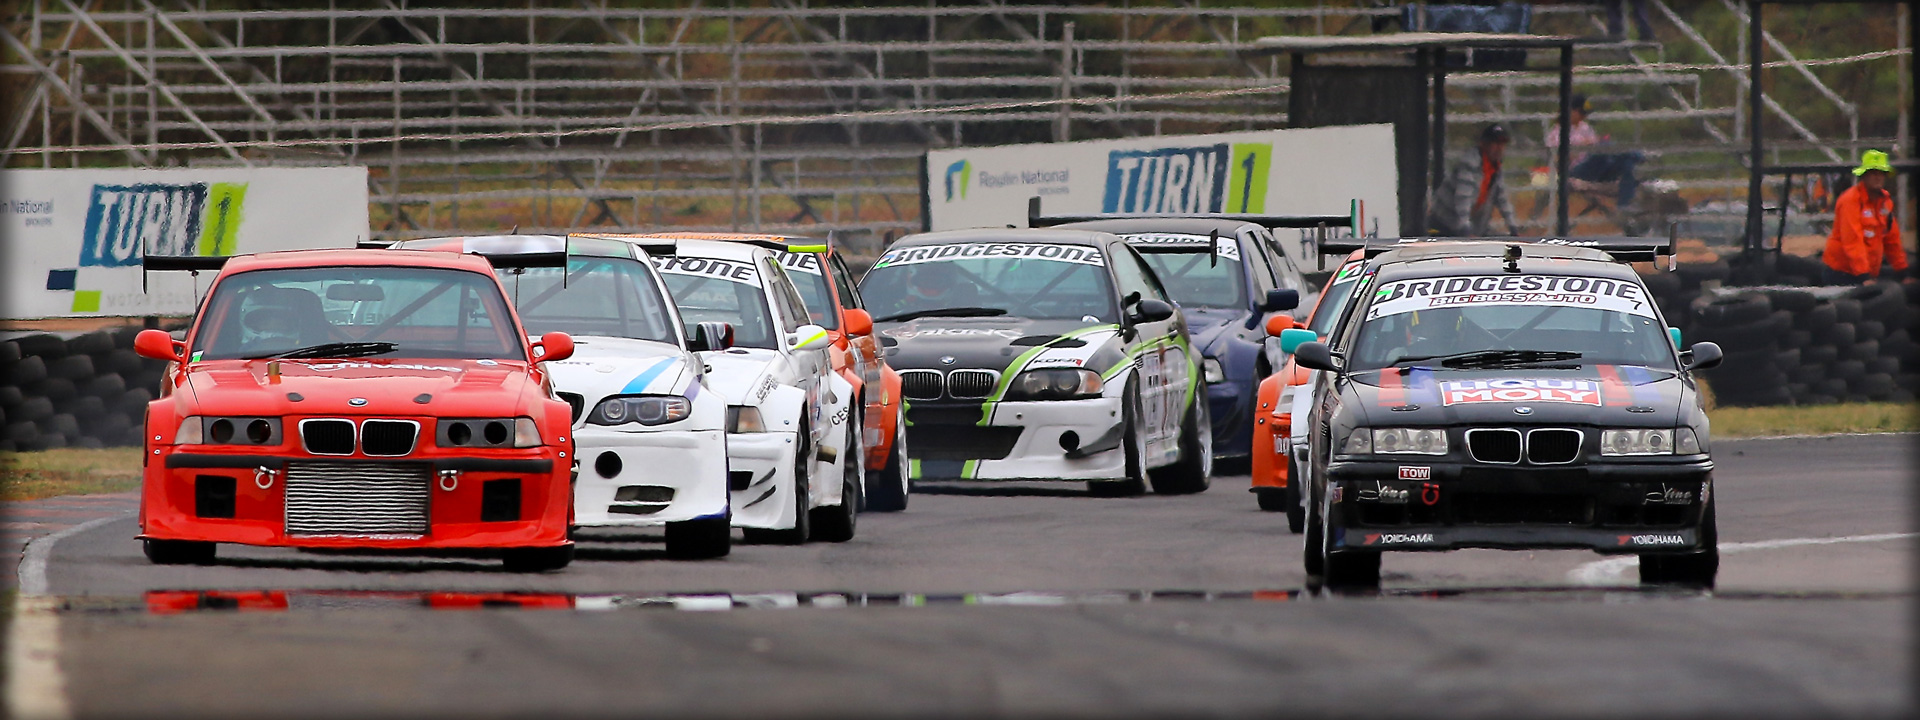 Bridgestone BMW Club Racing Series - Round 6 - Zwartkops - 2016-09-17 - Race Report